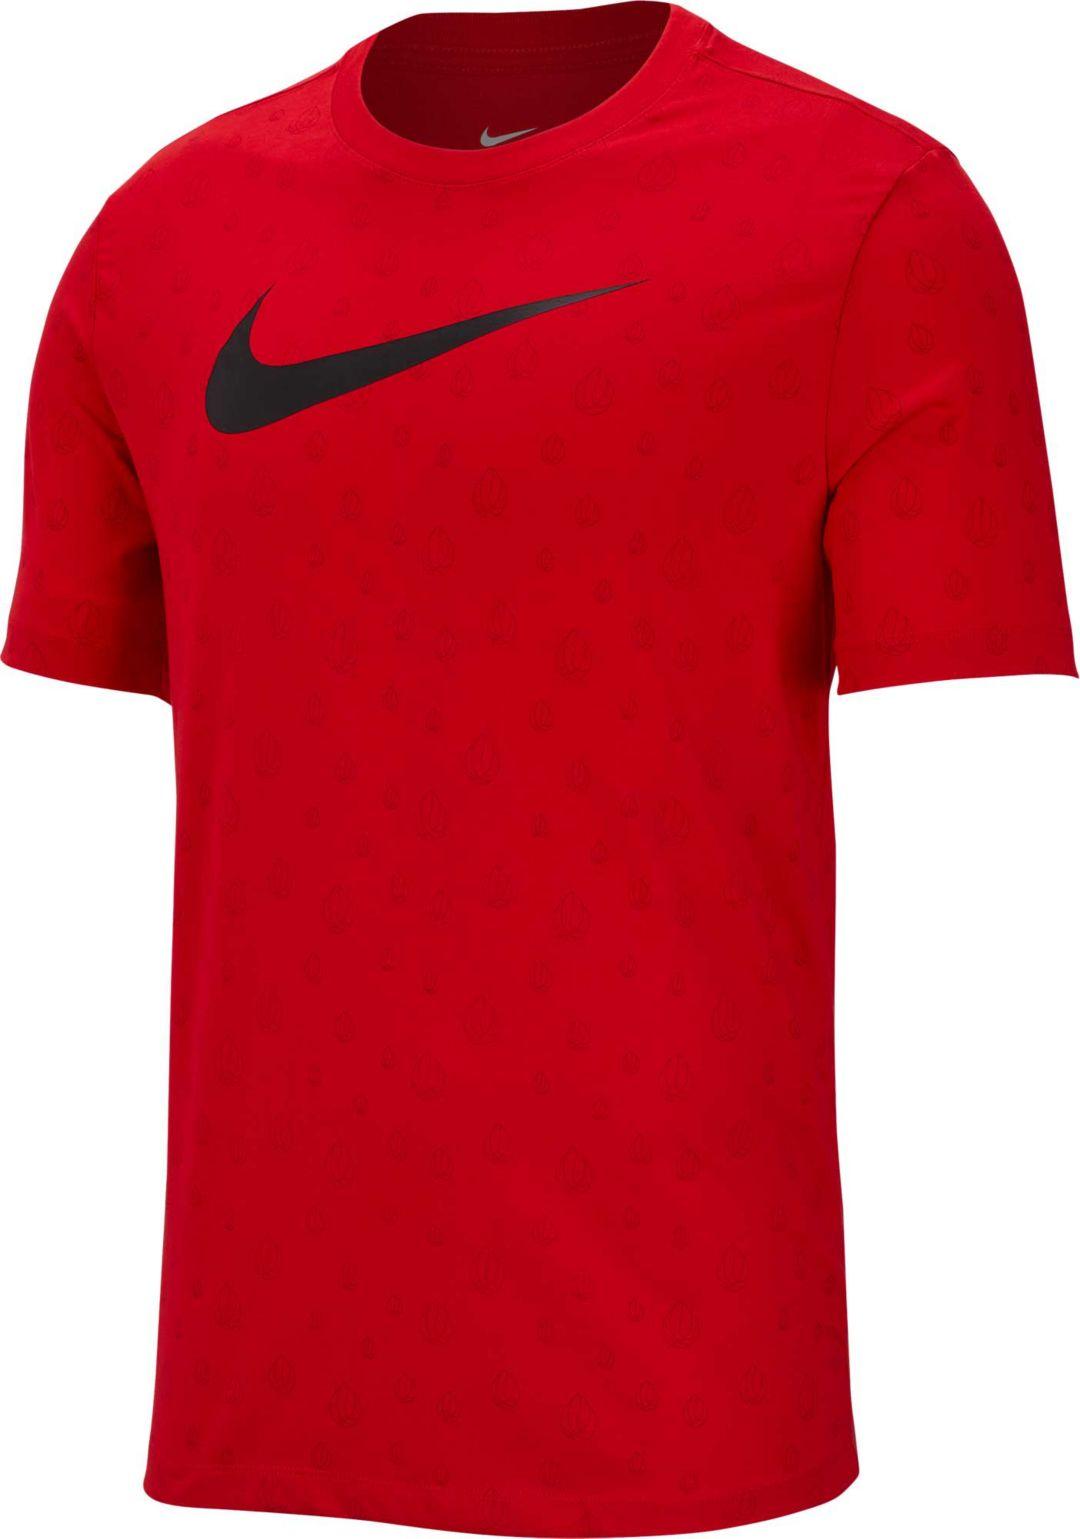 0ea09ab880dcd Nike Men's Raindrop Dri-FIT Graphic Tee | DICK'S Sporting Goods